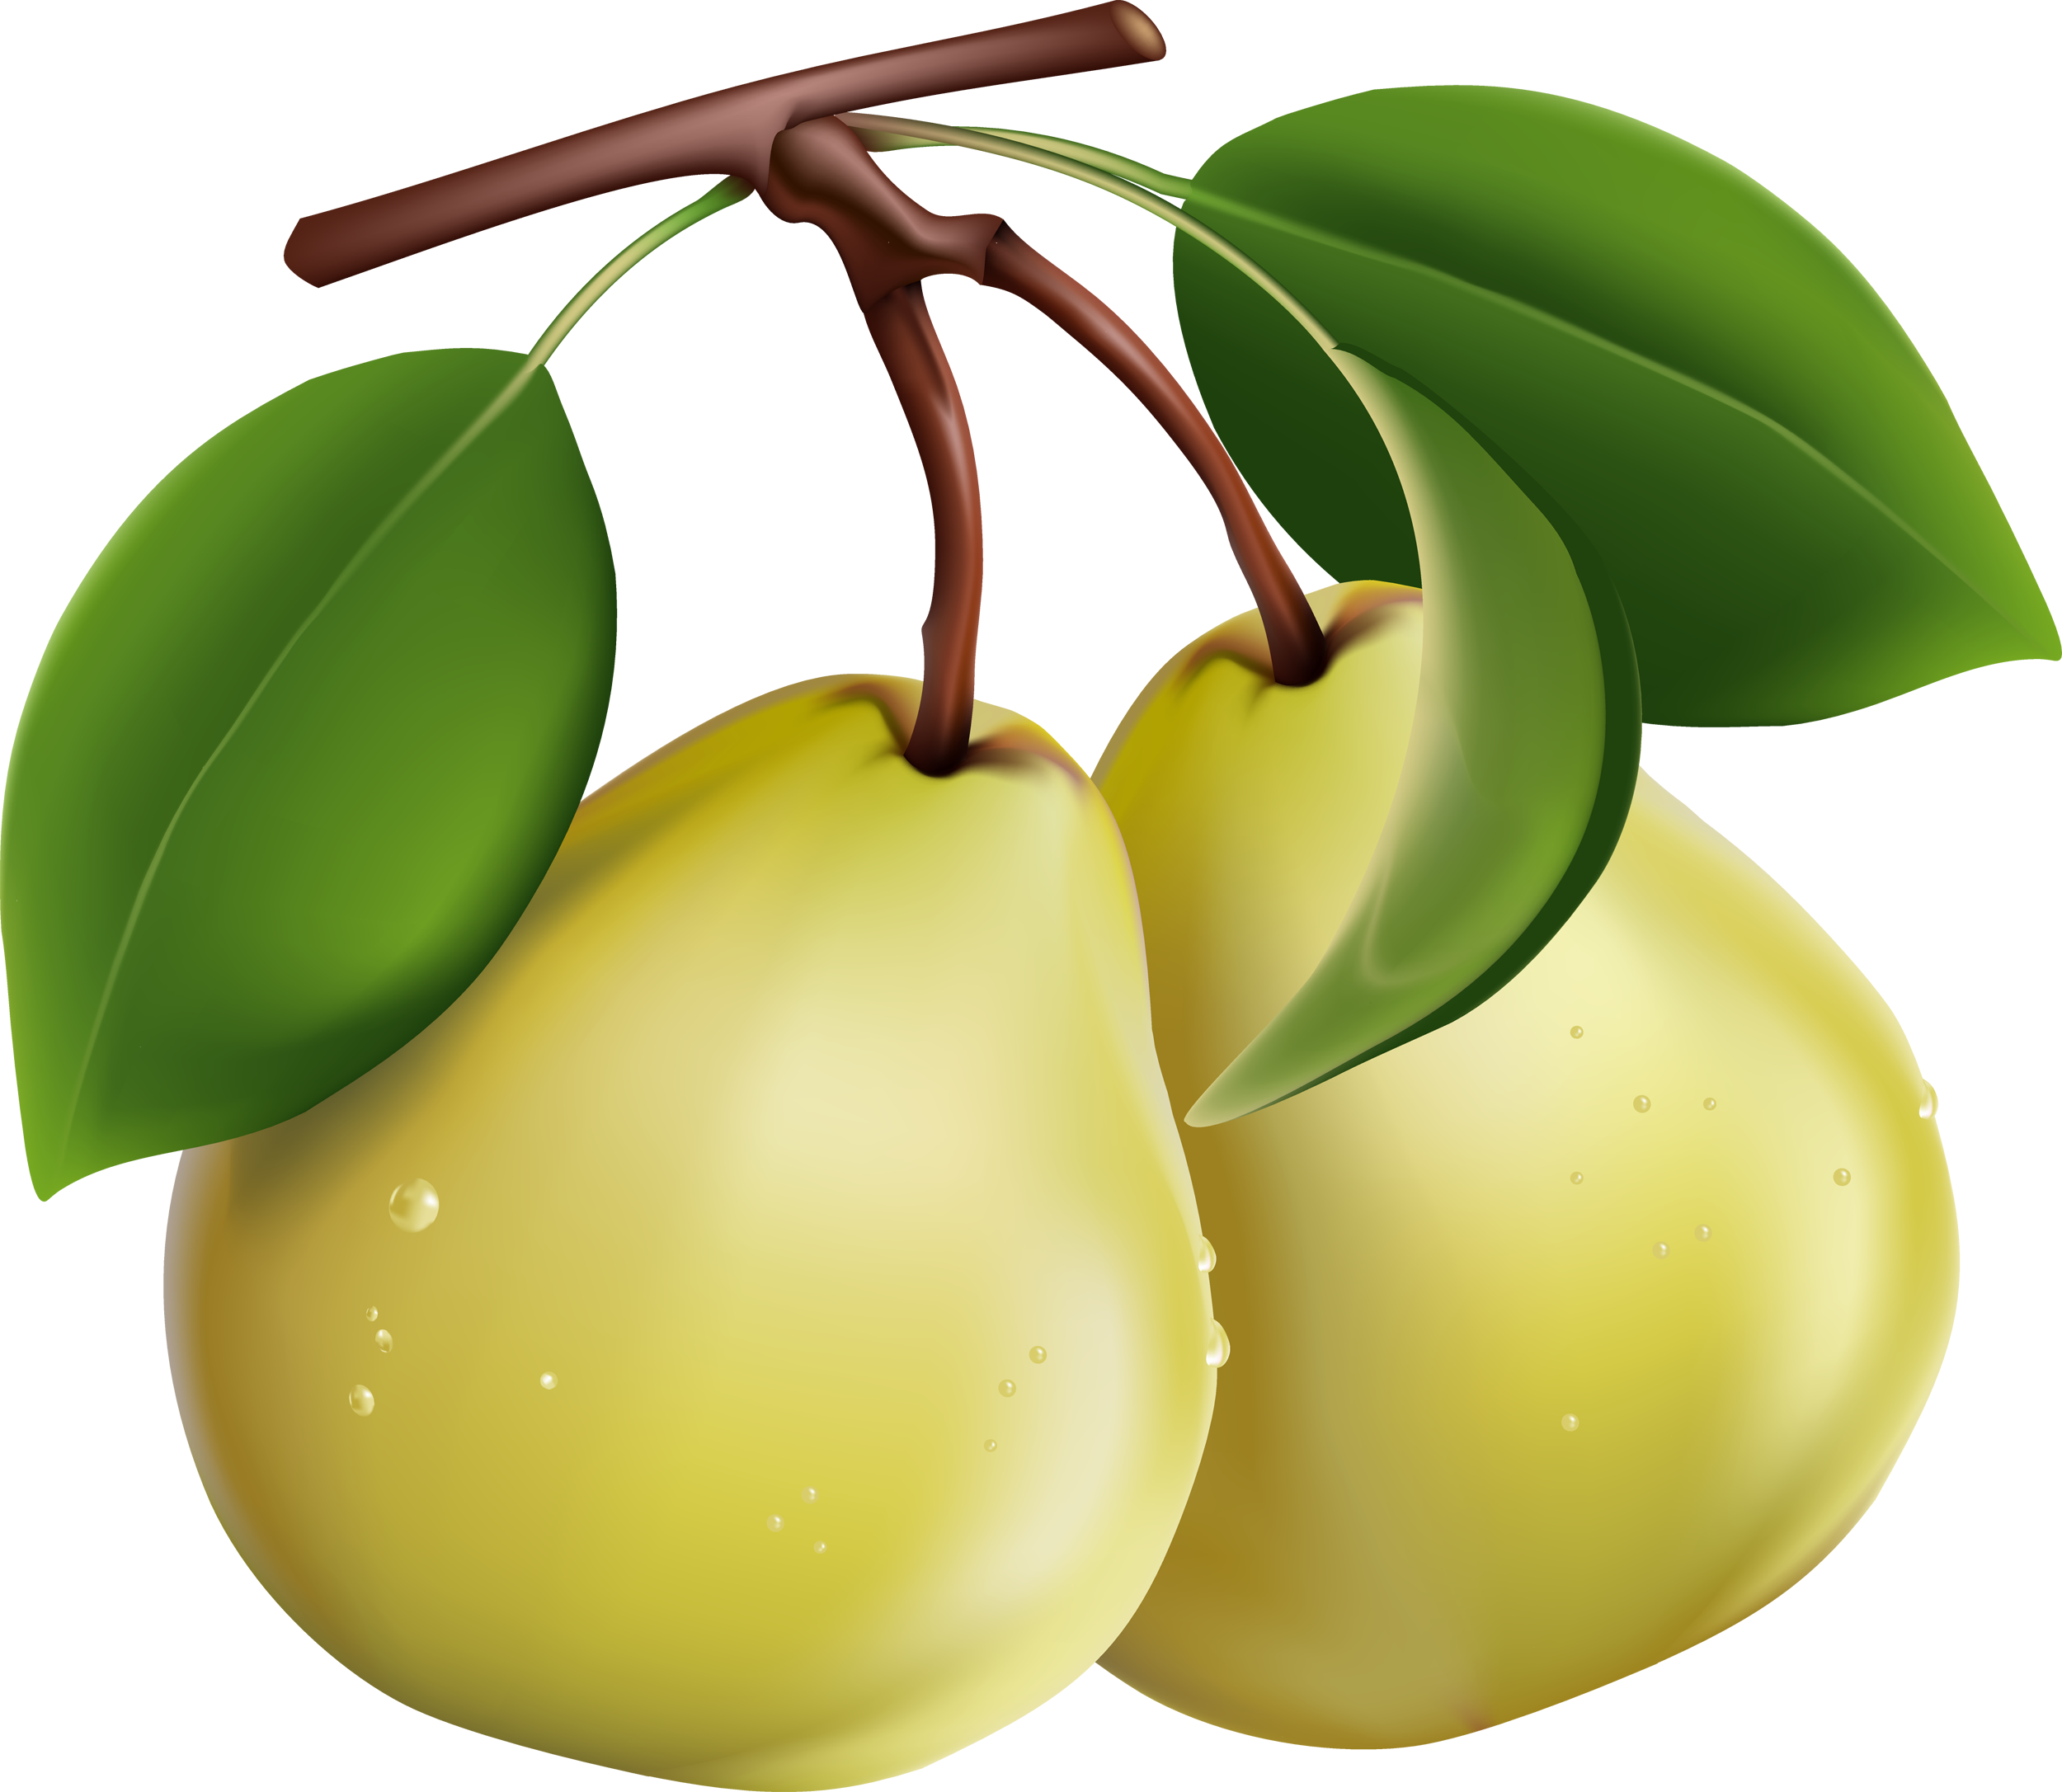 фрукты груши